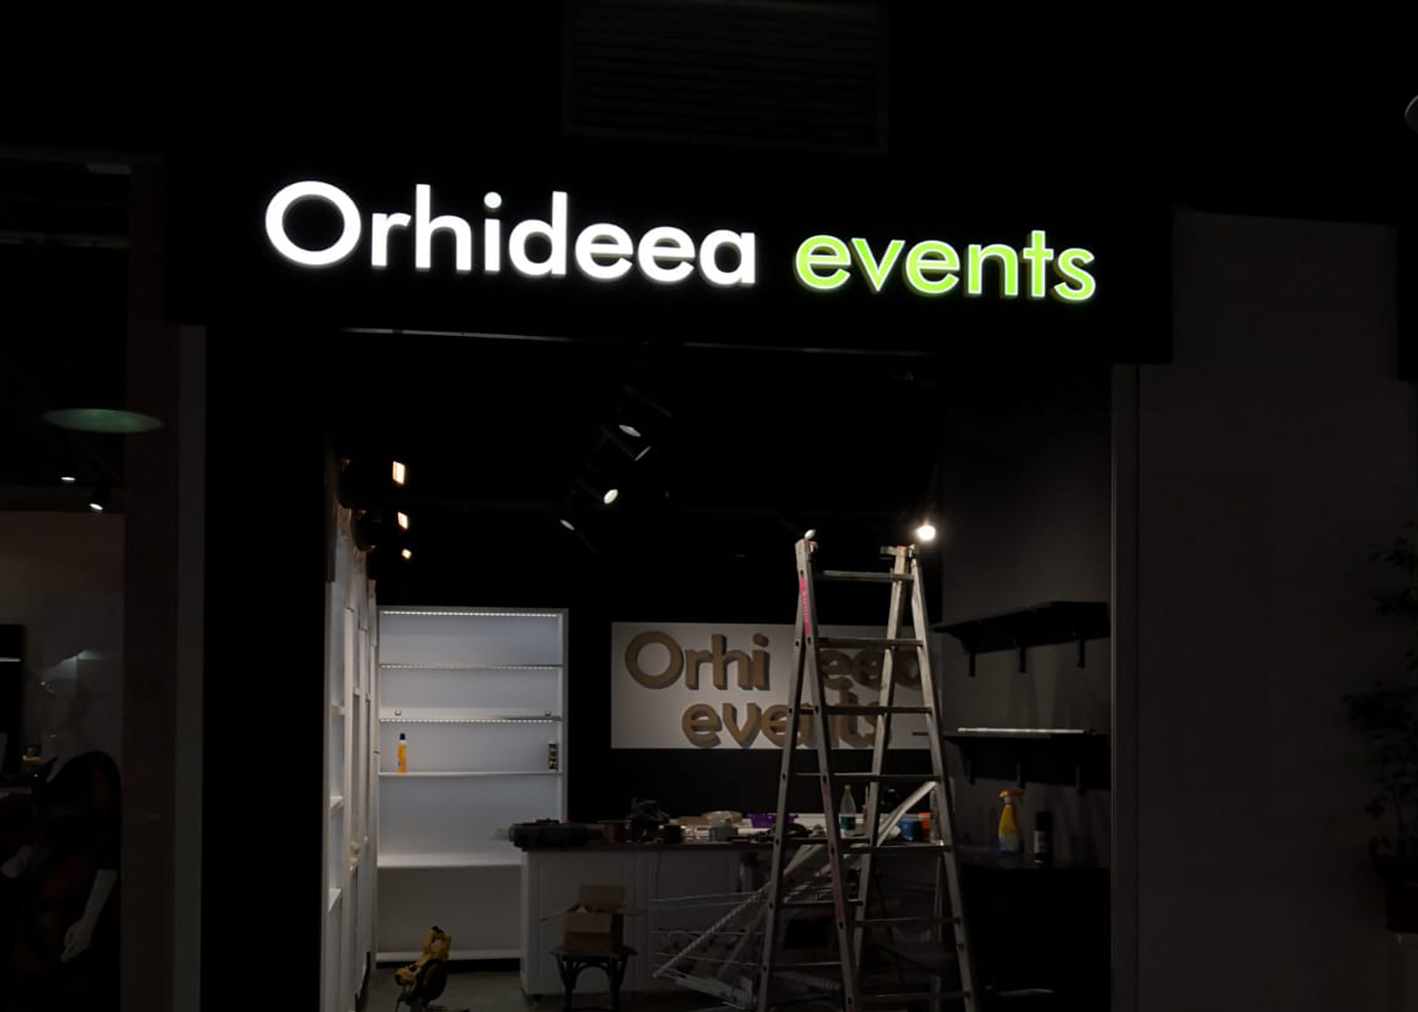 Orhideea events